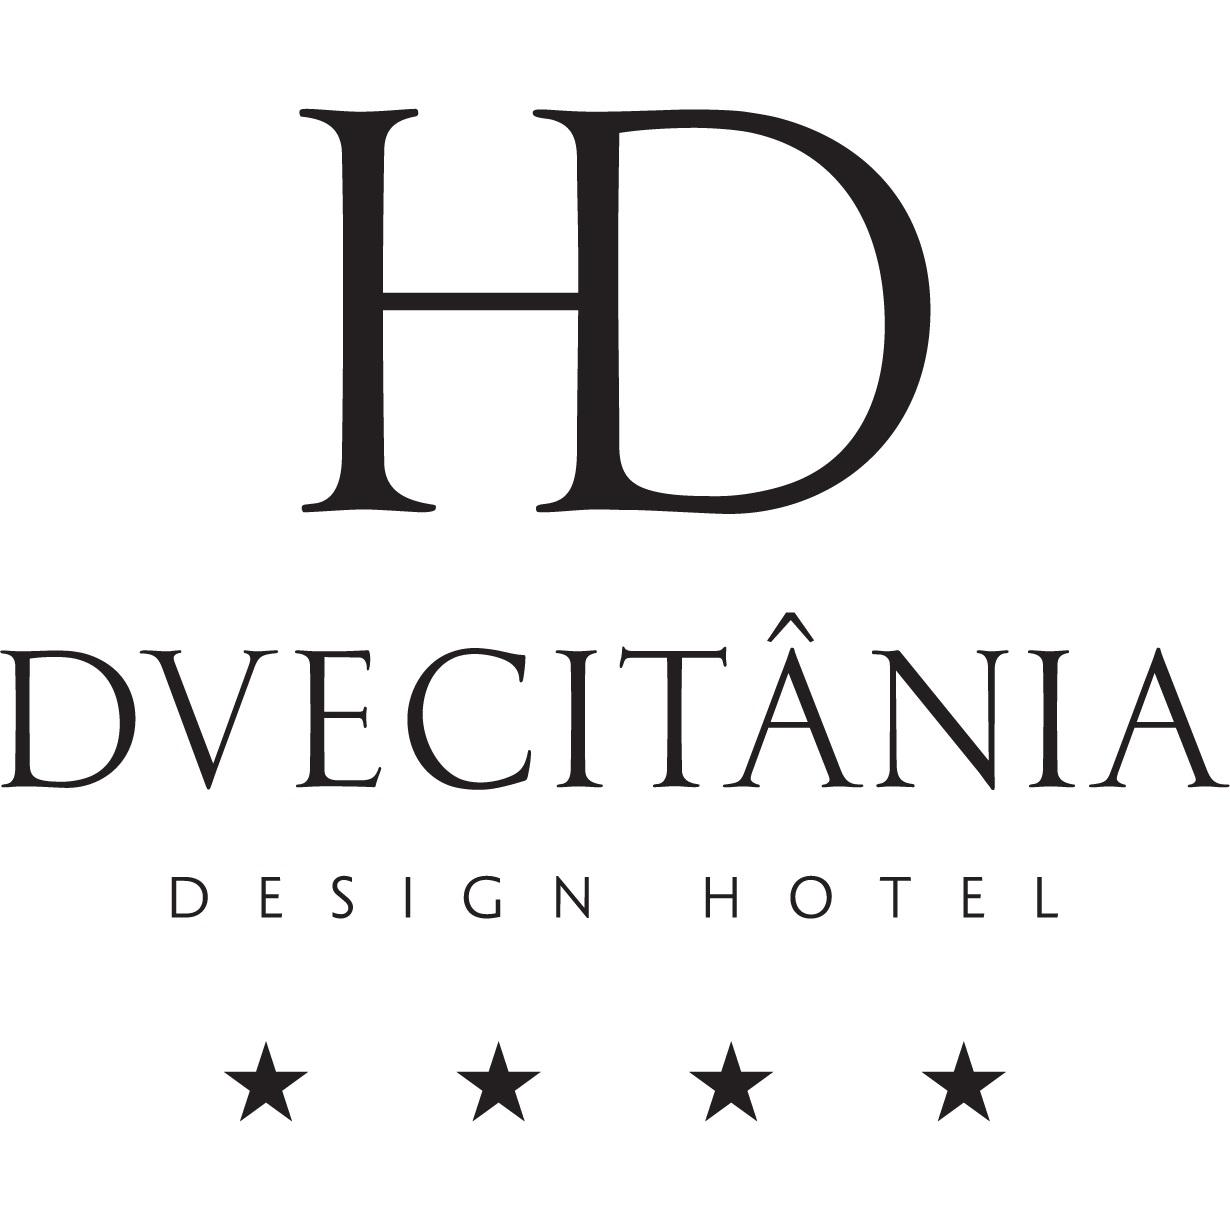 Meetings events at hd duecit nia design hotel penela for Design hotels logo